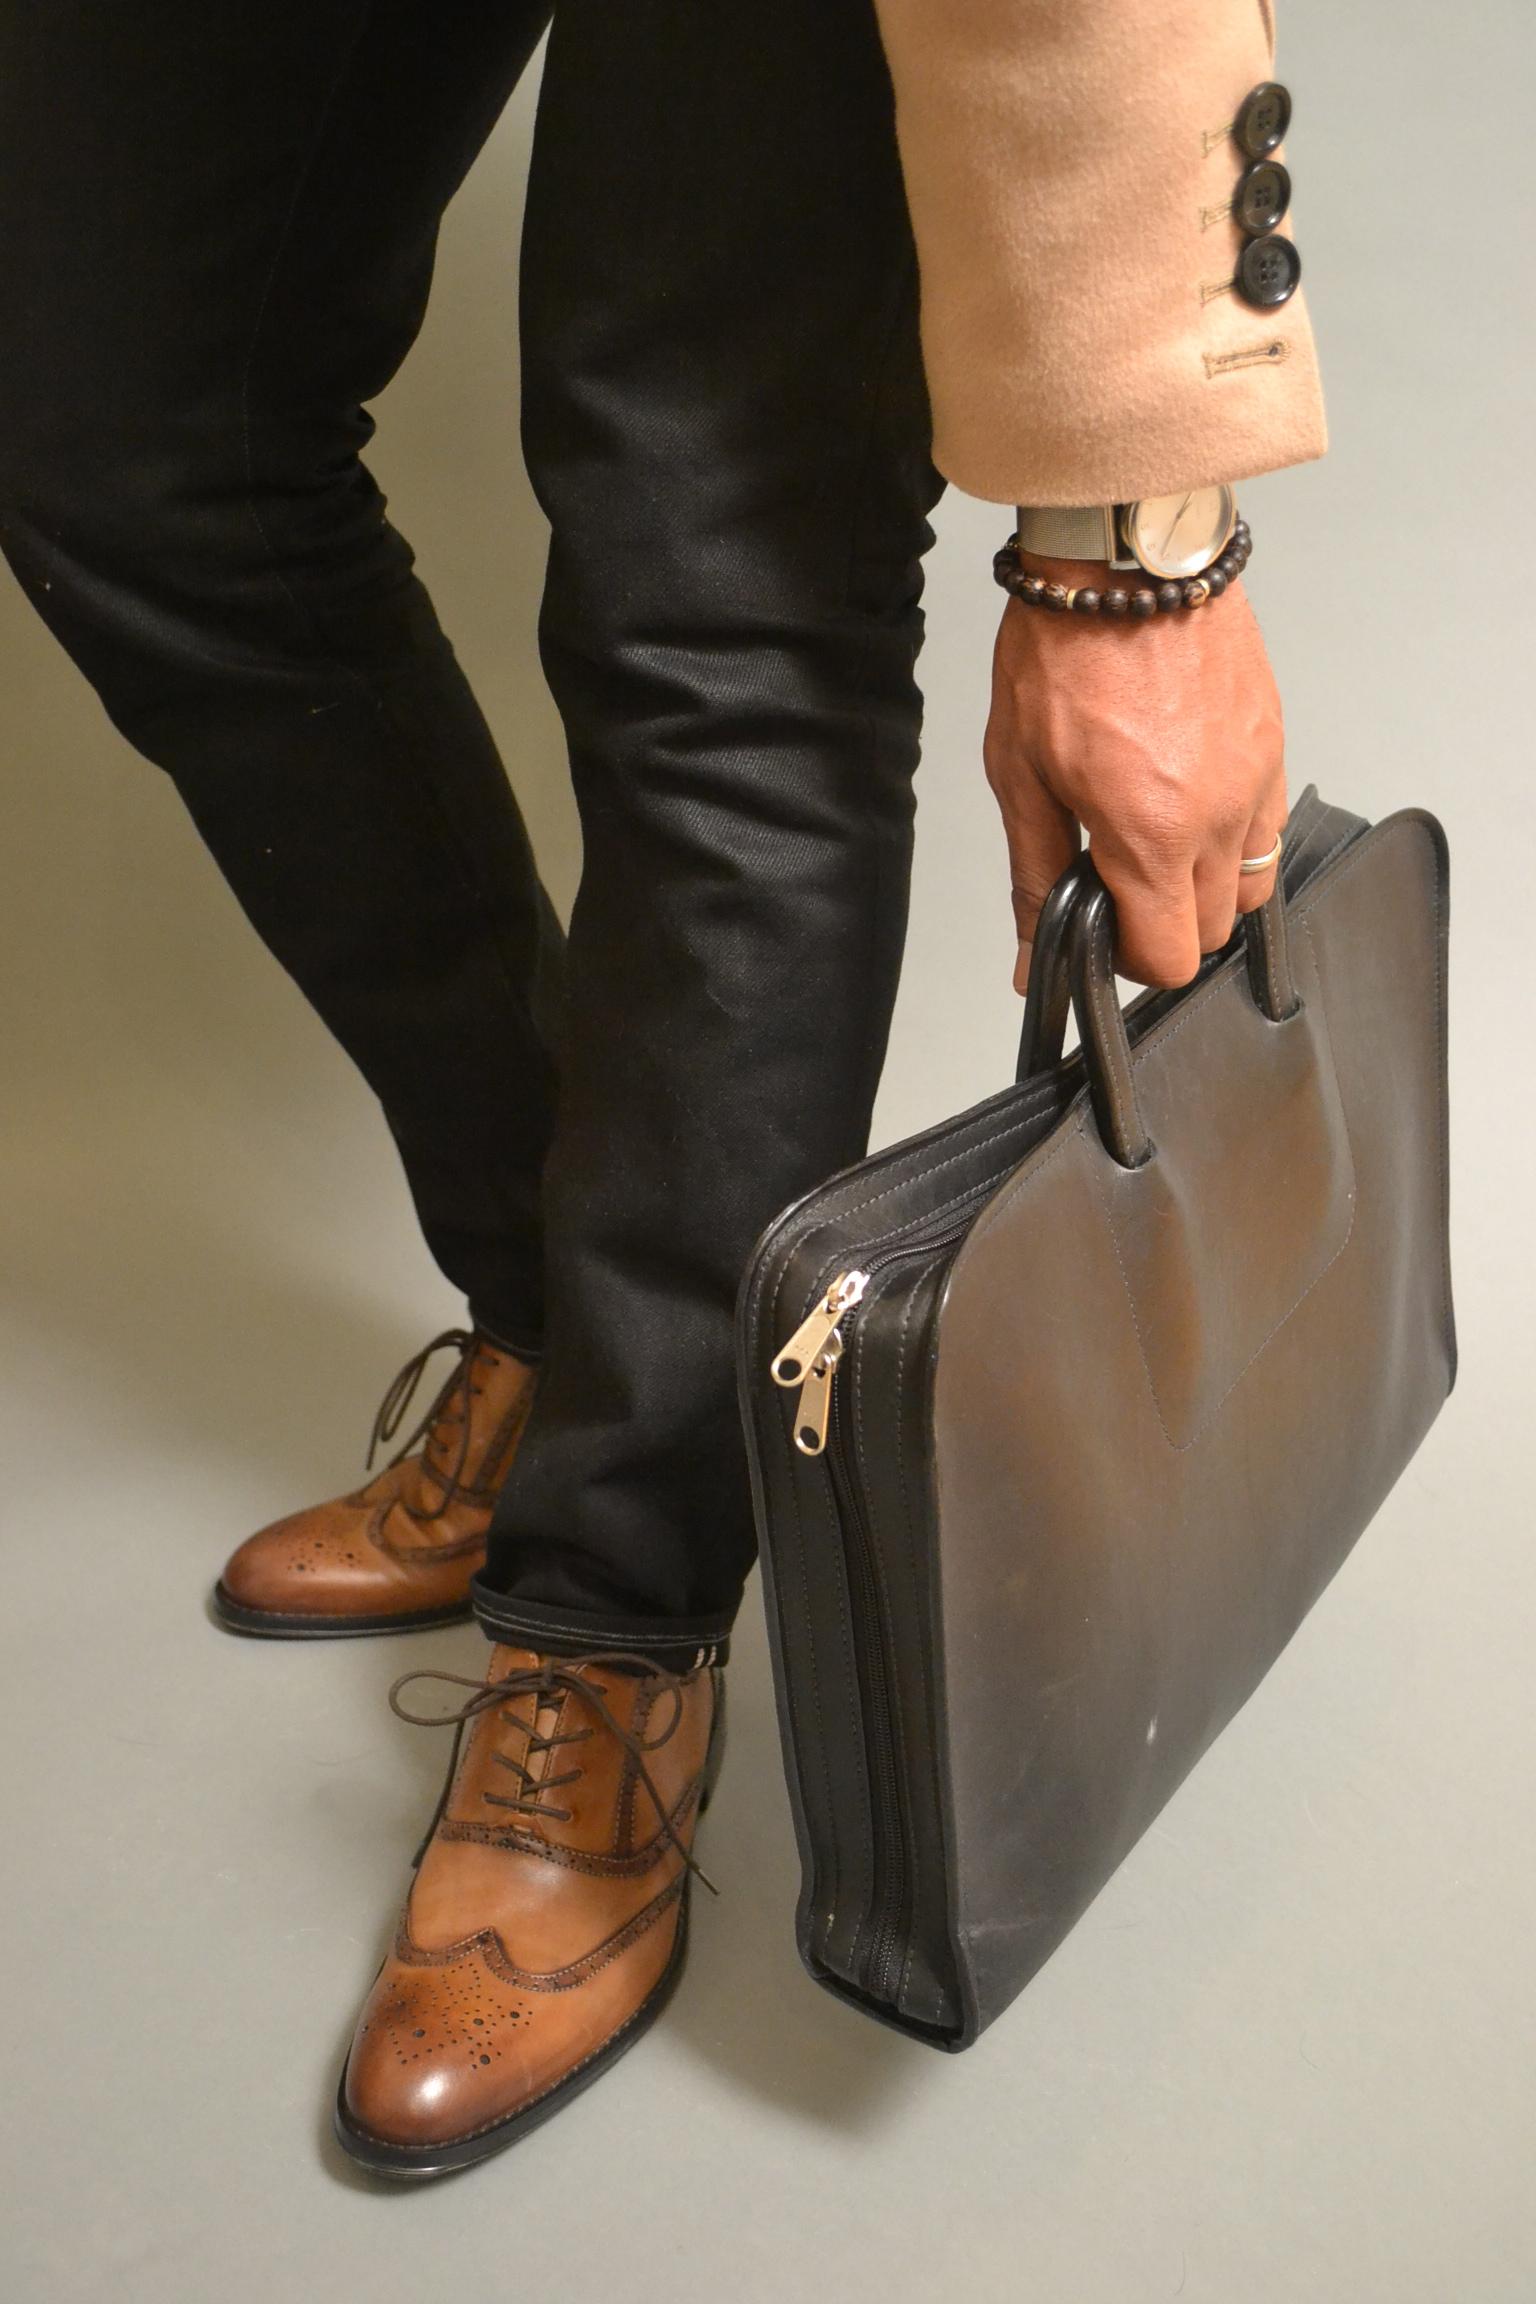 Sabir in Aston Grey Wingtips, 3x1 black jeans, tobox bracelet & korchmar briefcase